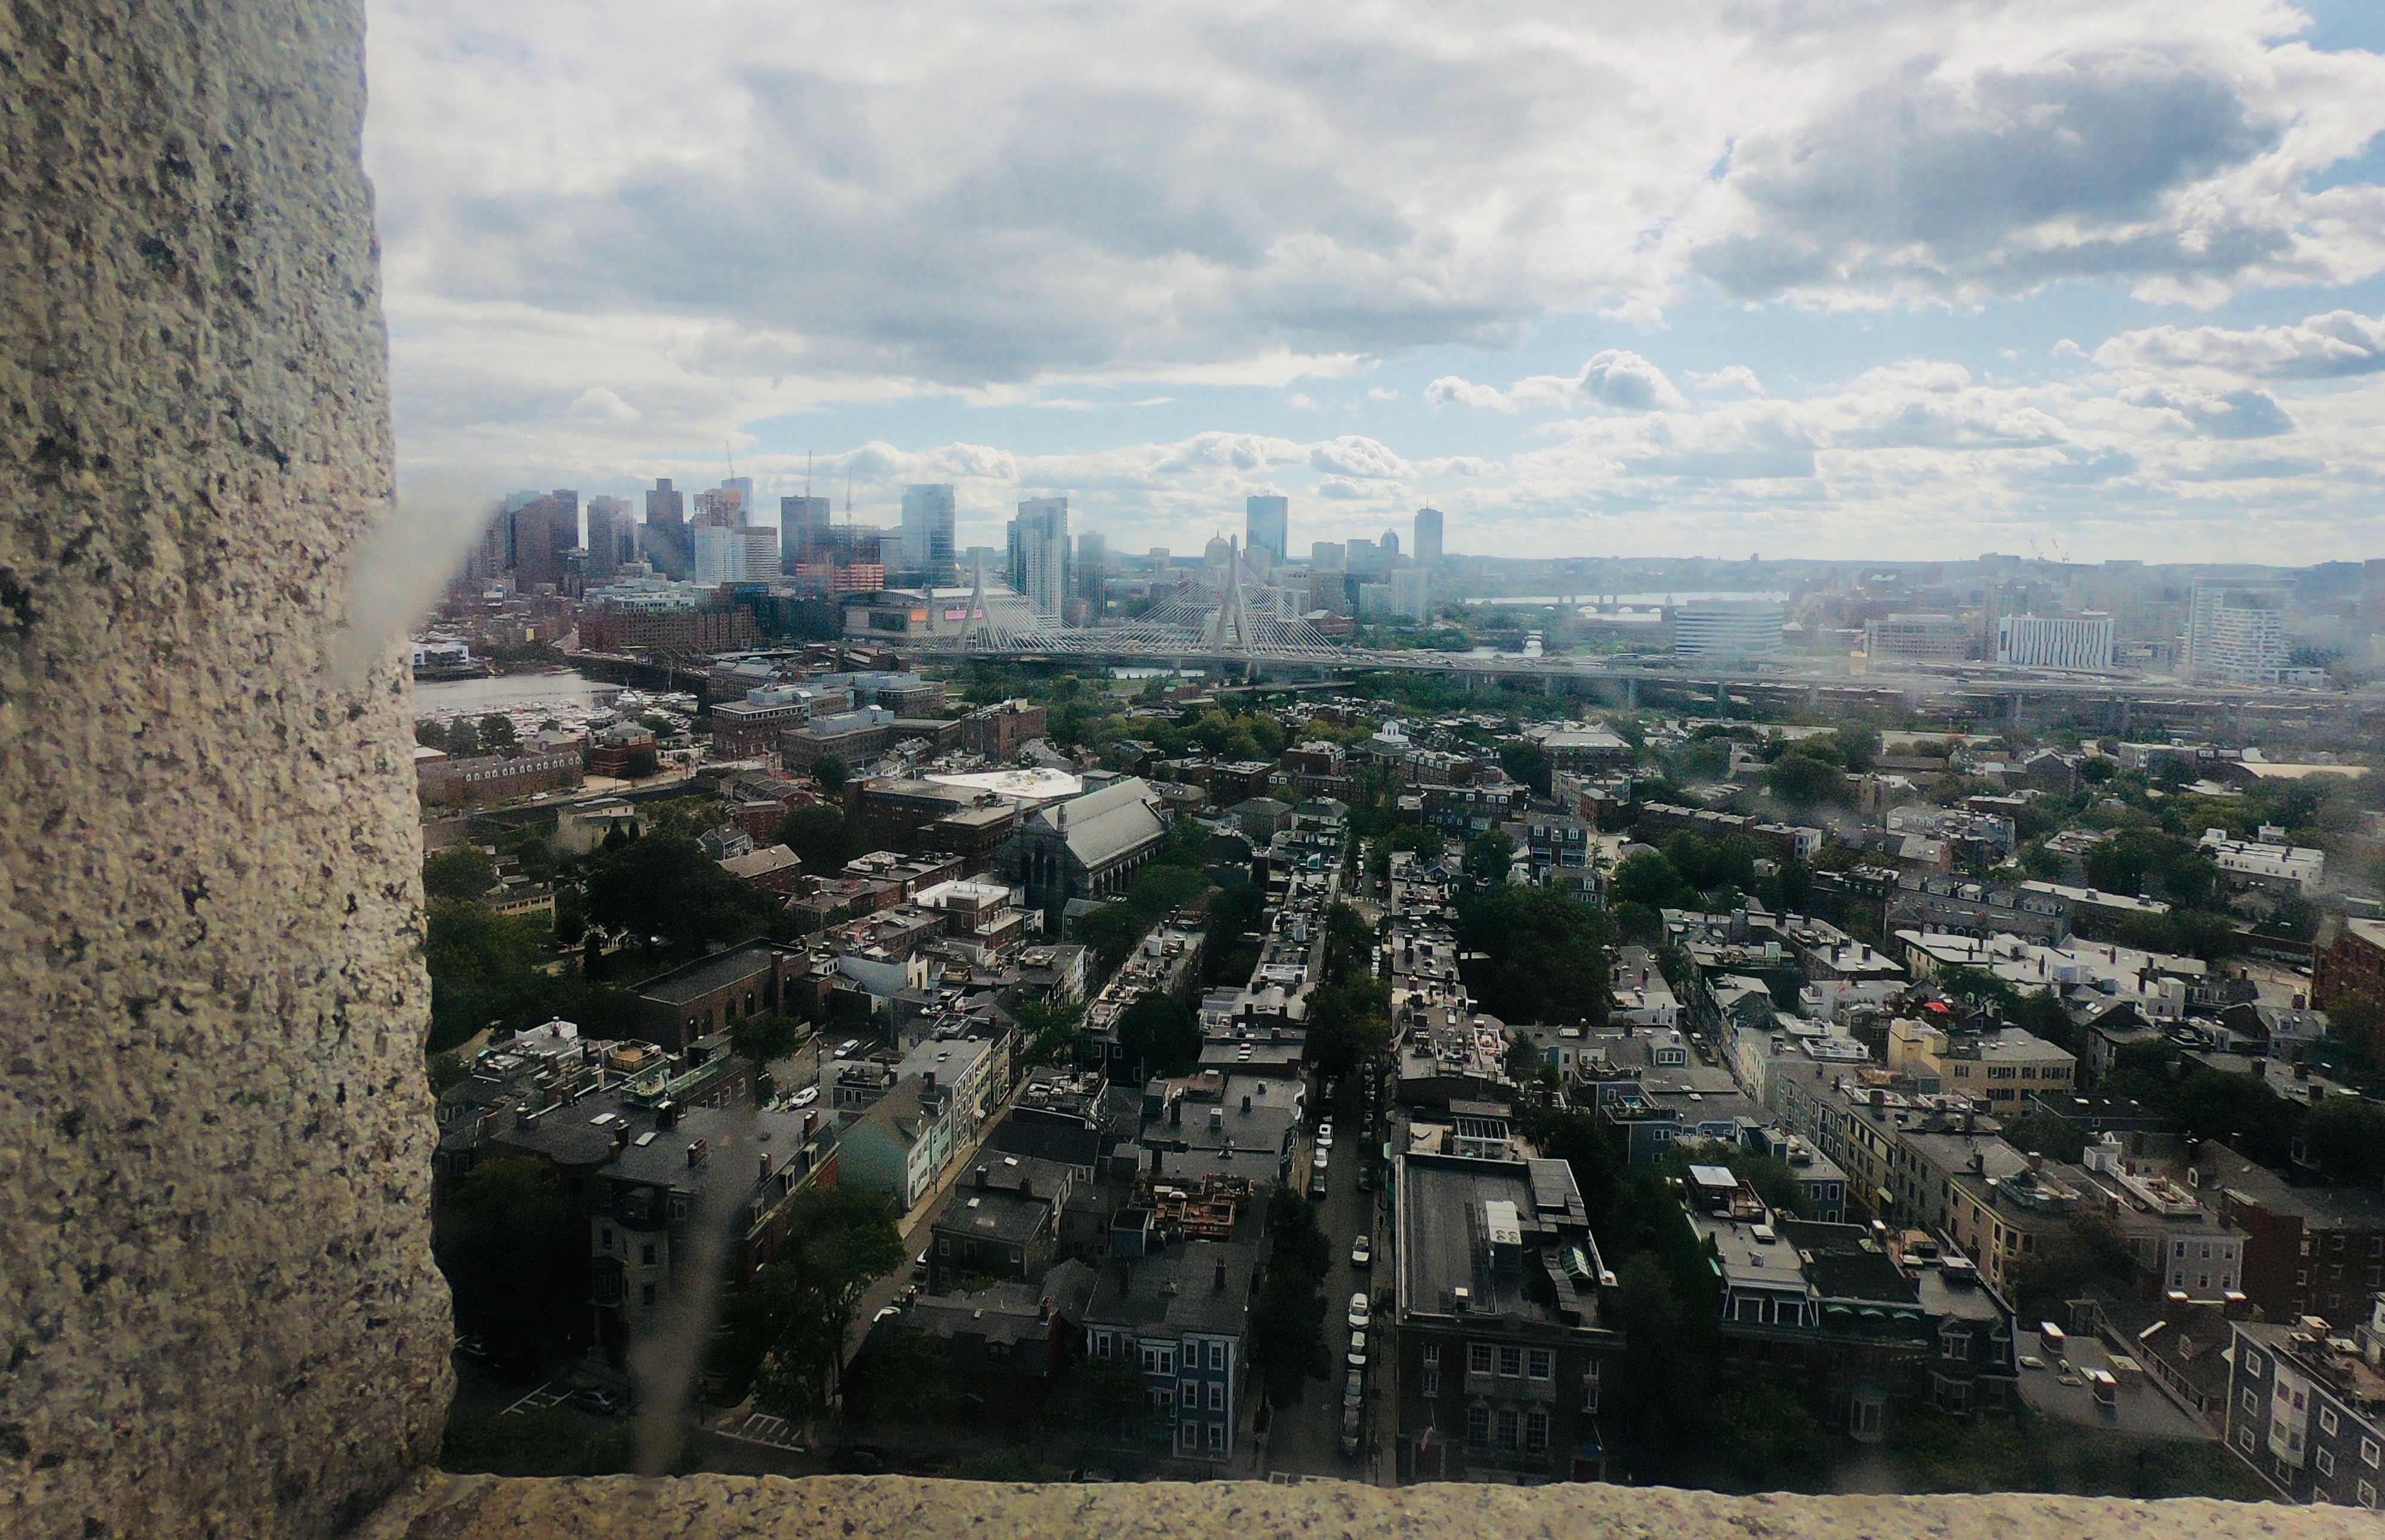 Bird's eye view from Bunker Hill Monument along the Freedom Trail in Boston, Massachusetts